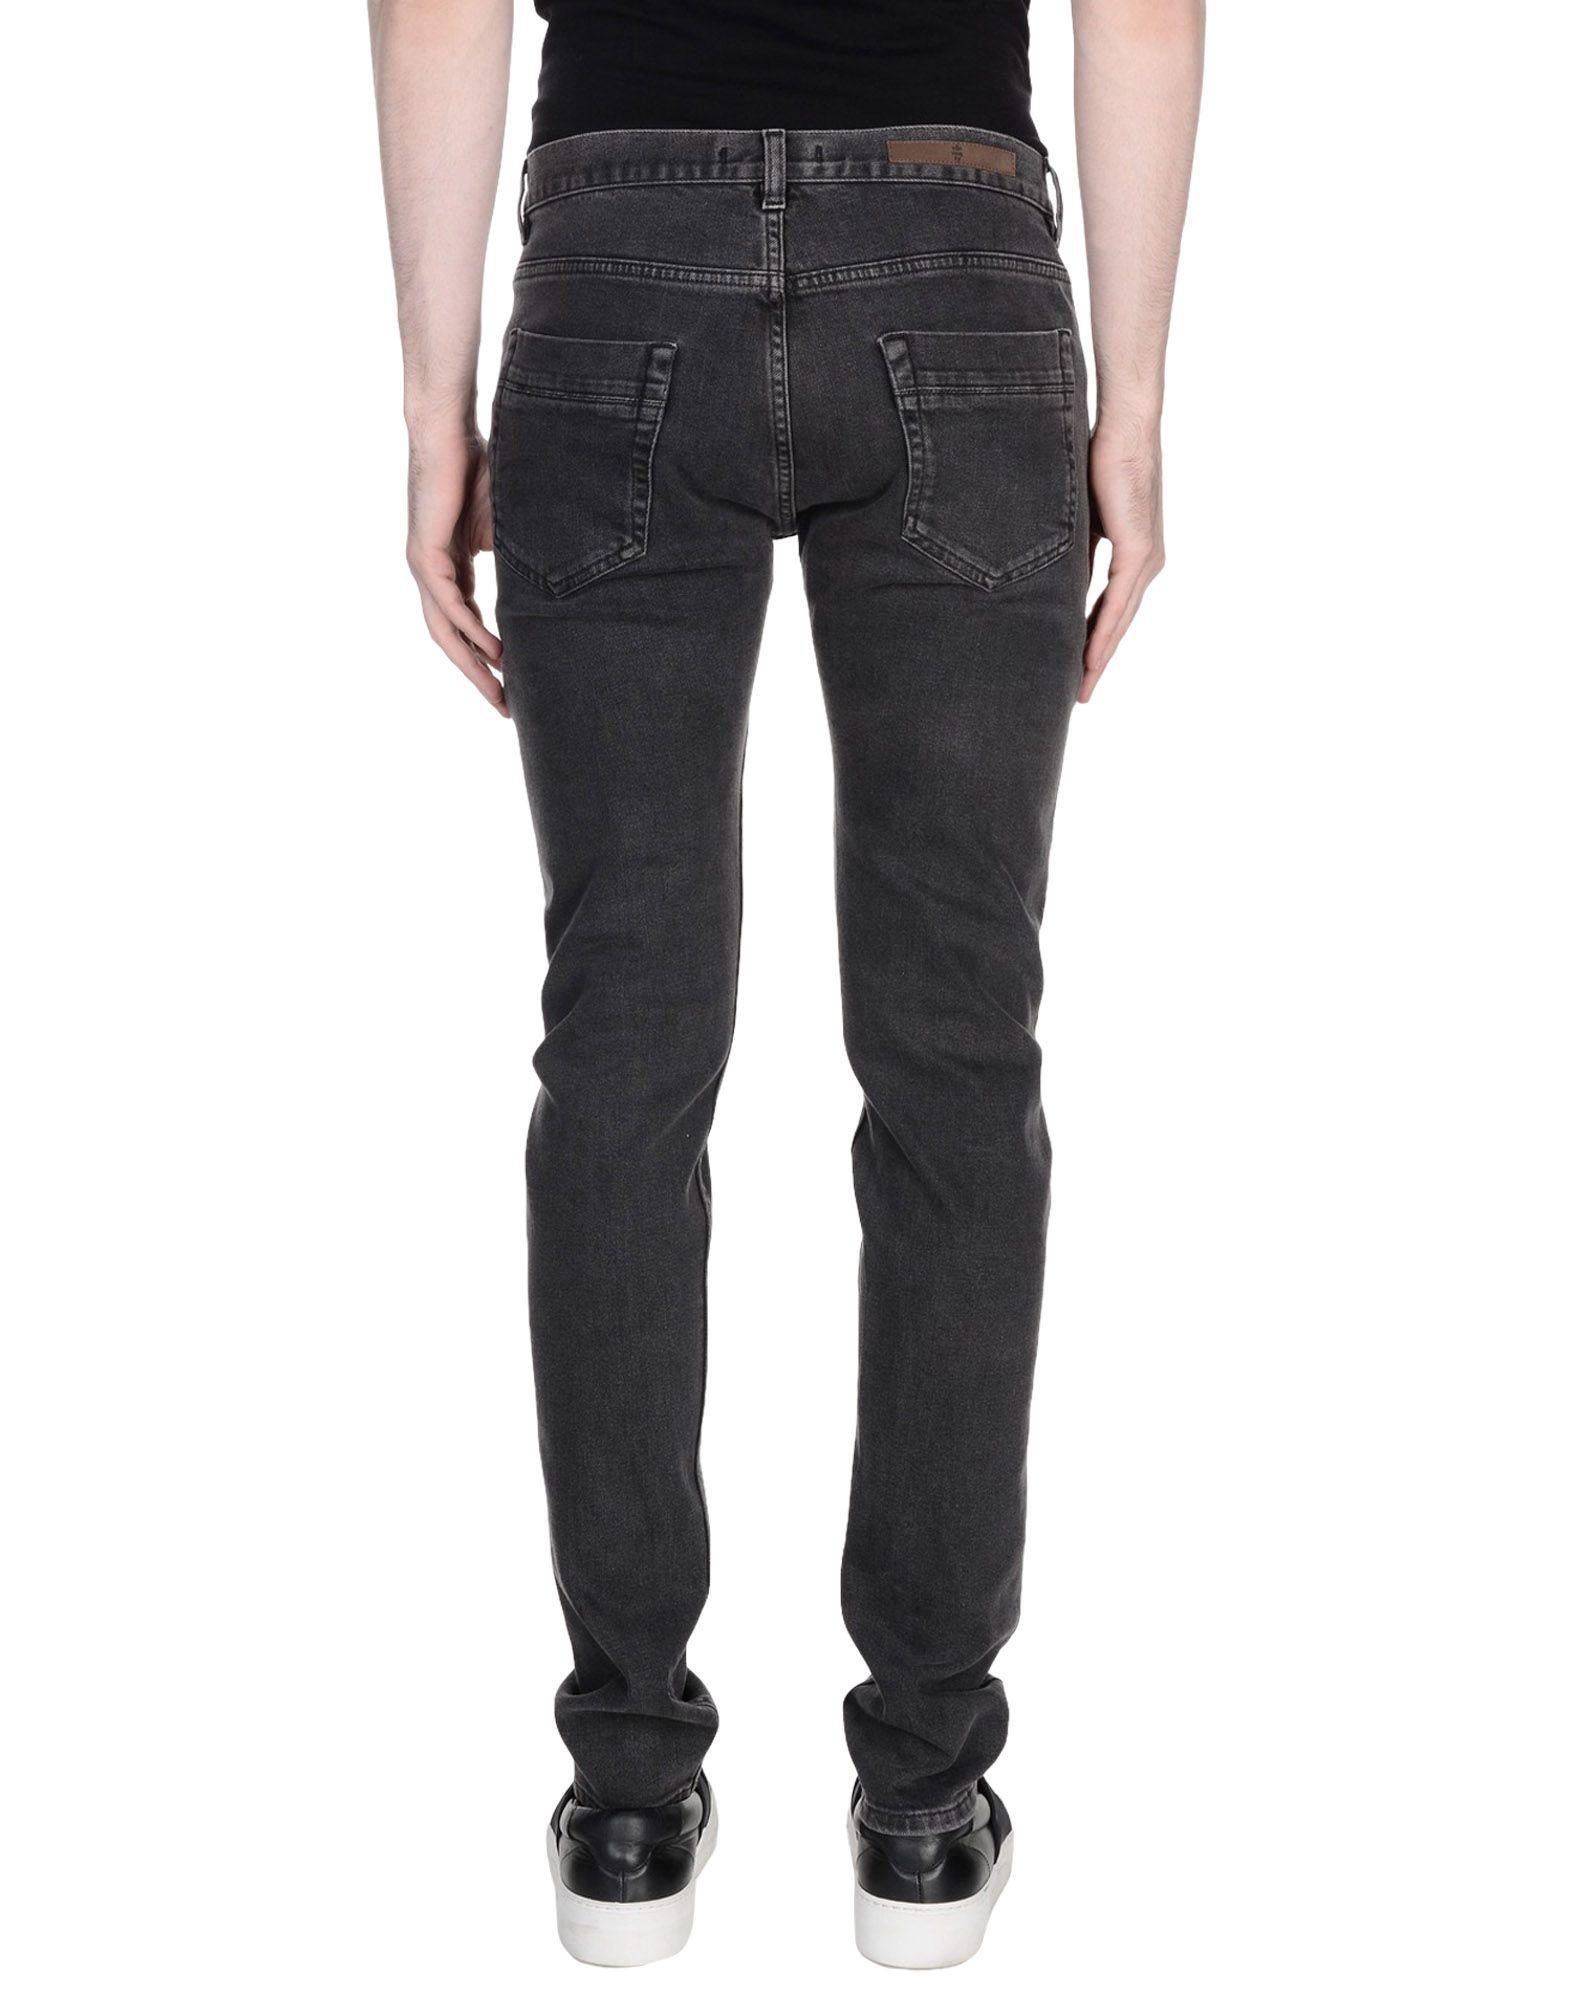 Pantaloni Jeans Eleventy Uomo Uomo Eleventy - 42533173VR 53f9ed